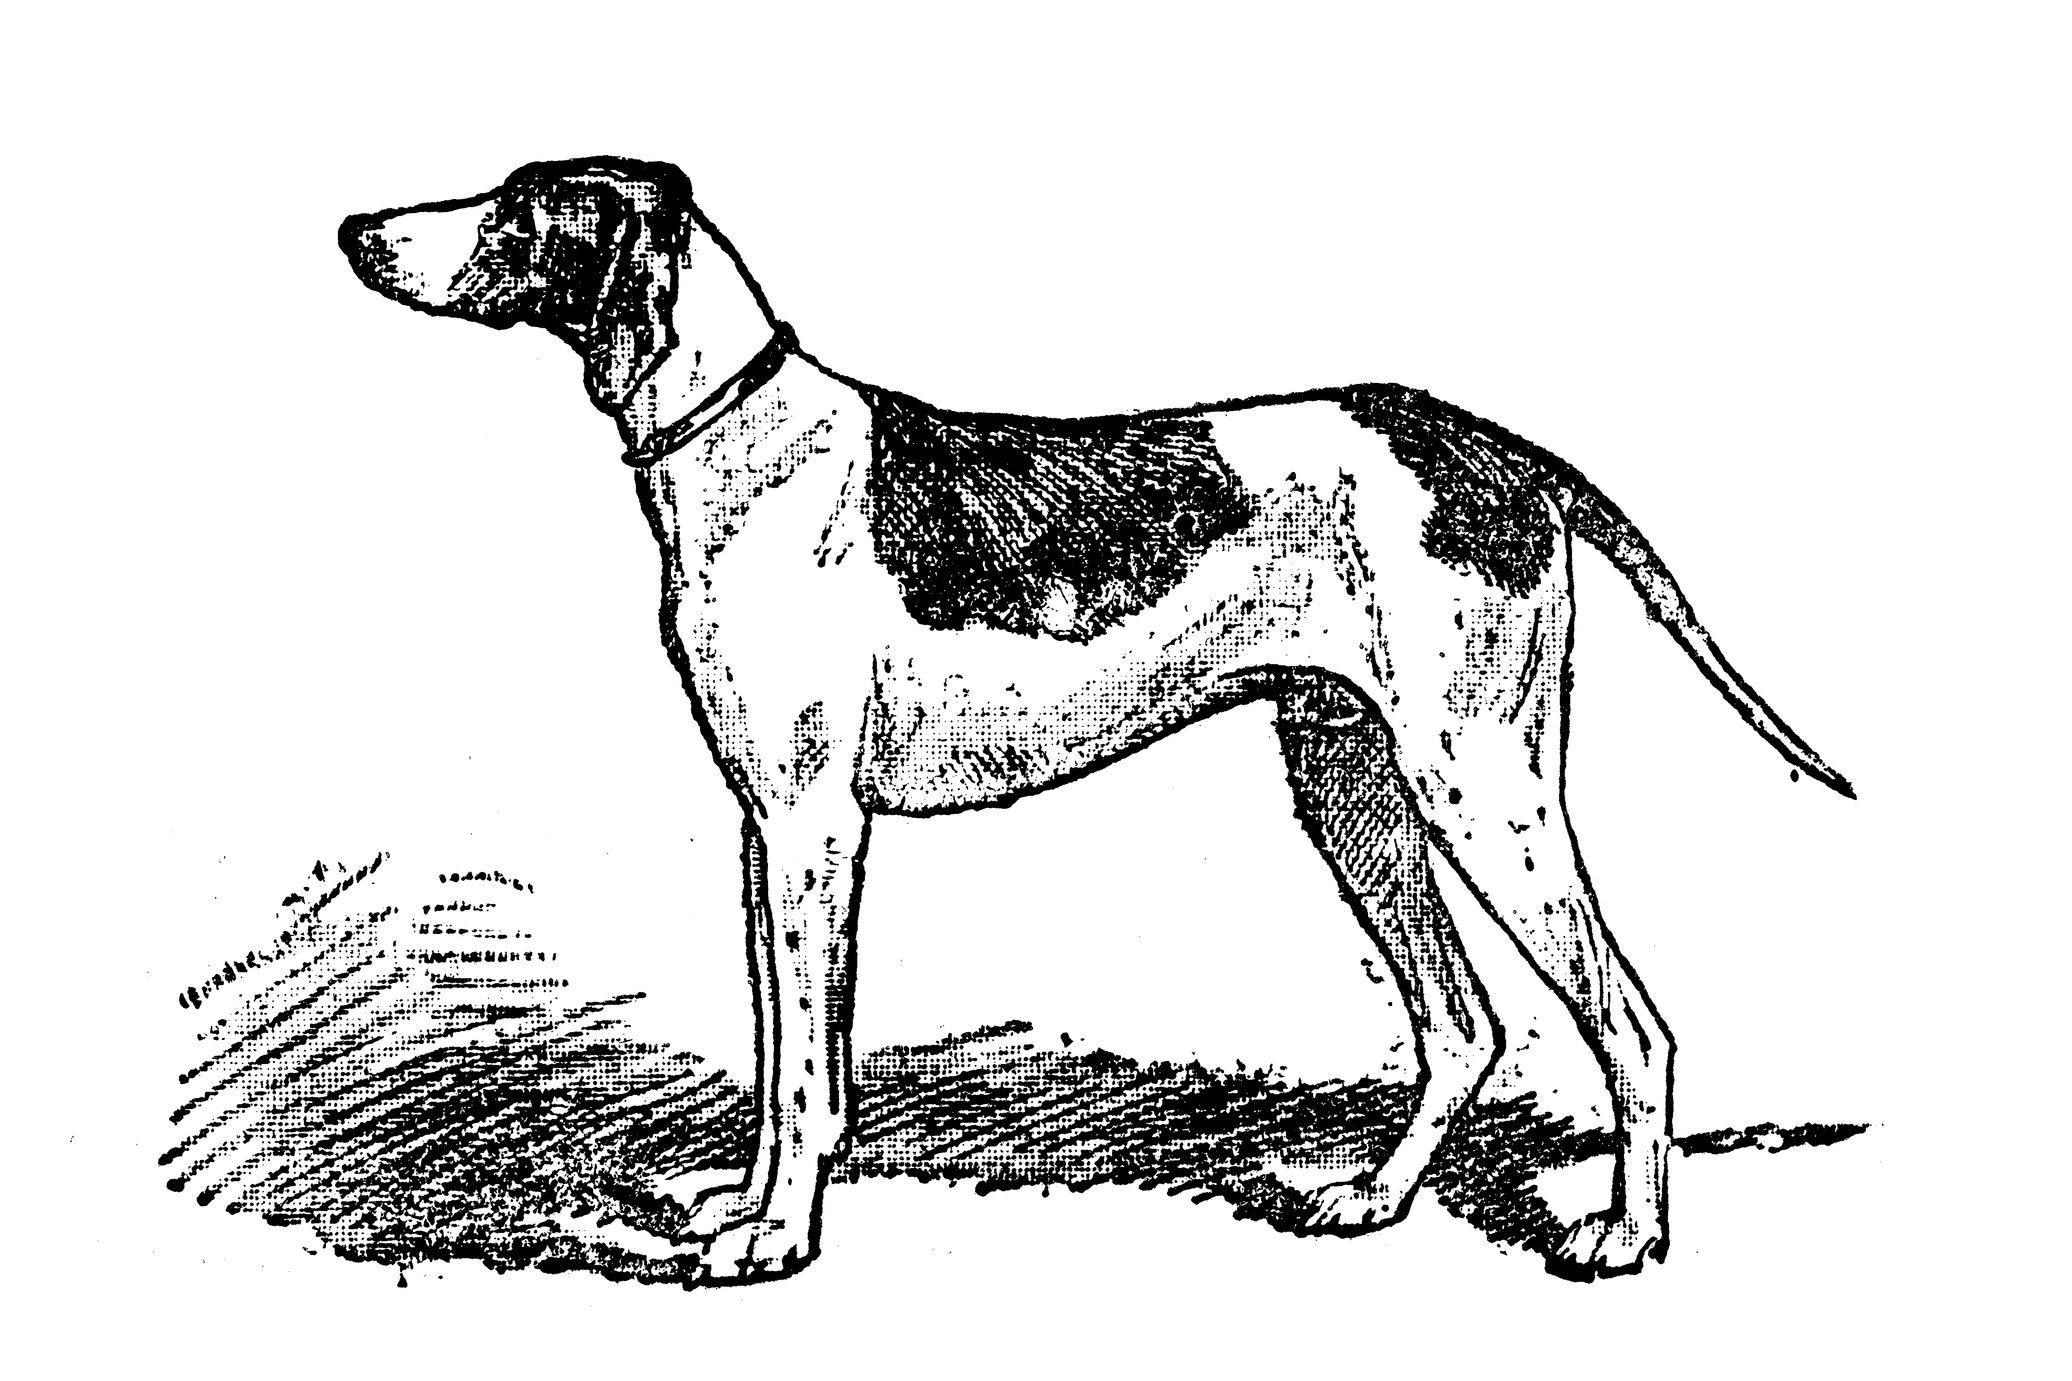 Antique illustration of dog (Braque du Puy)